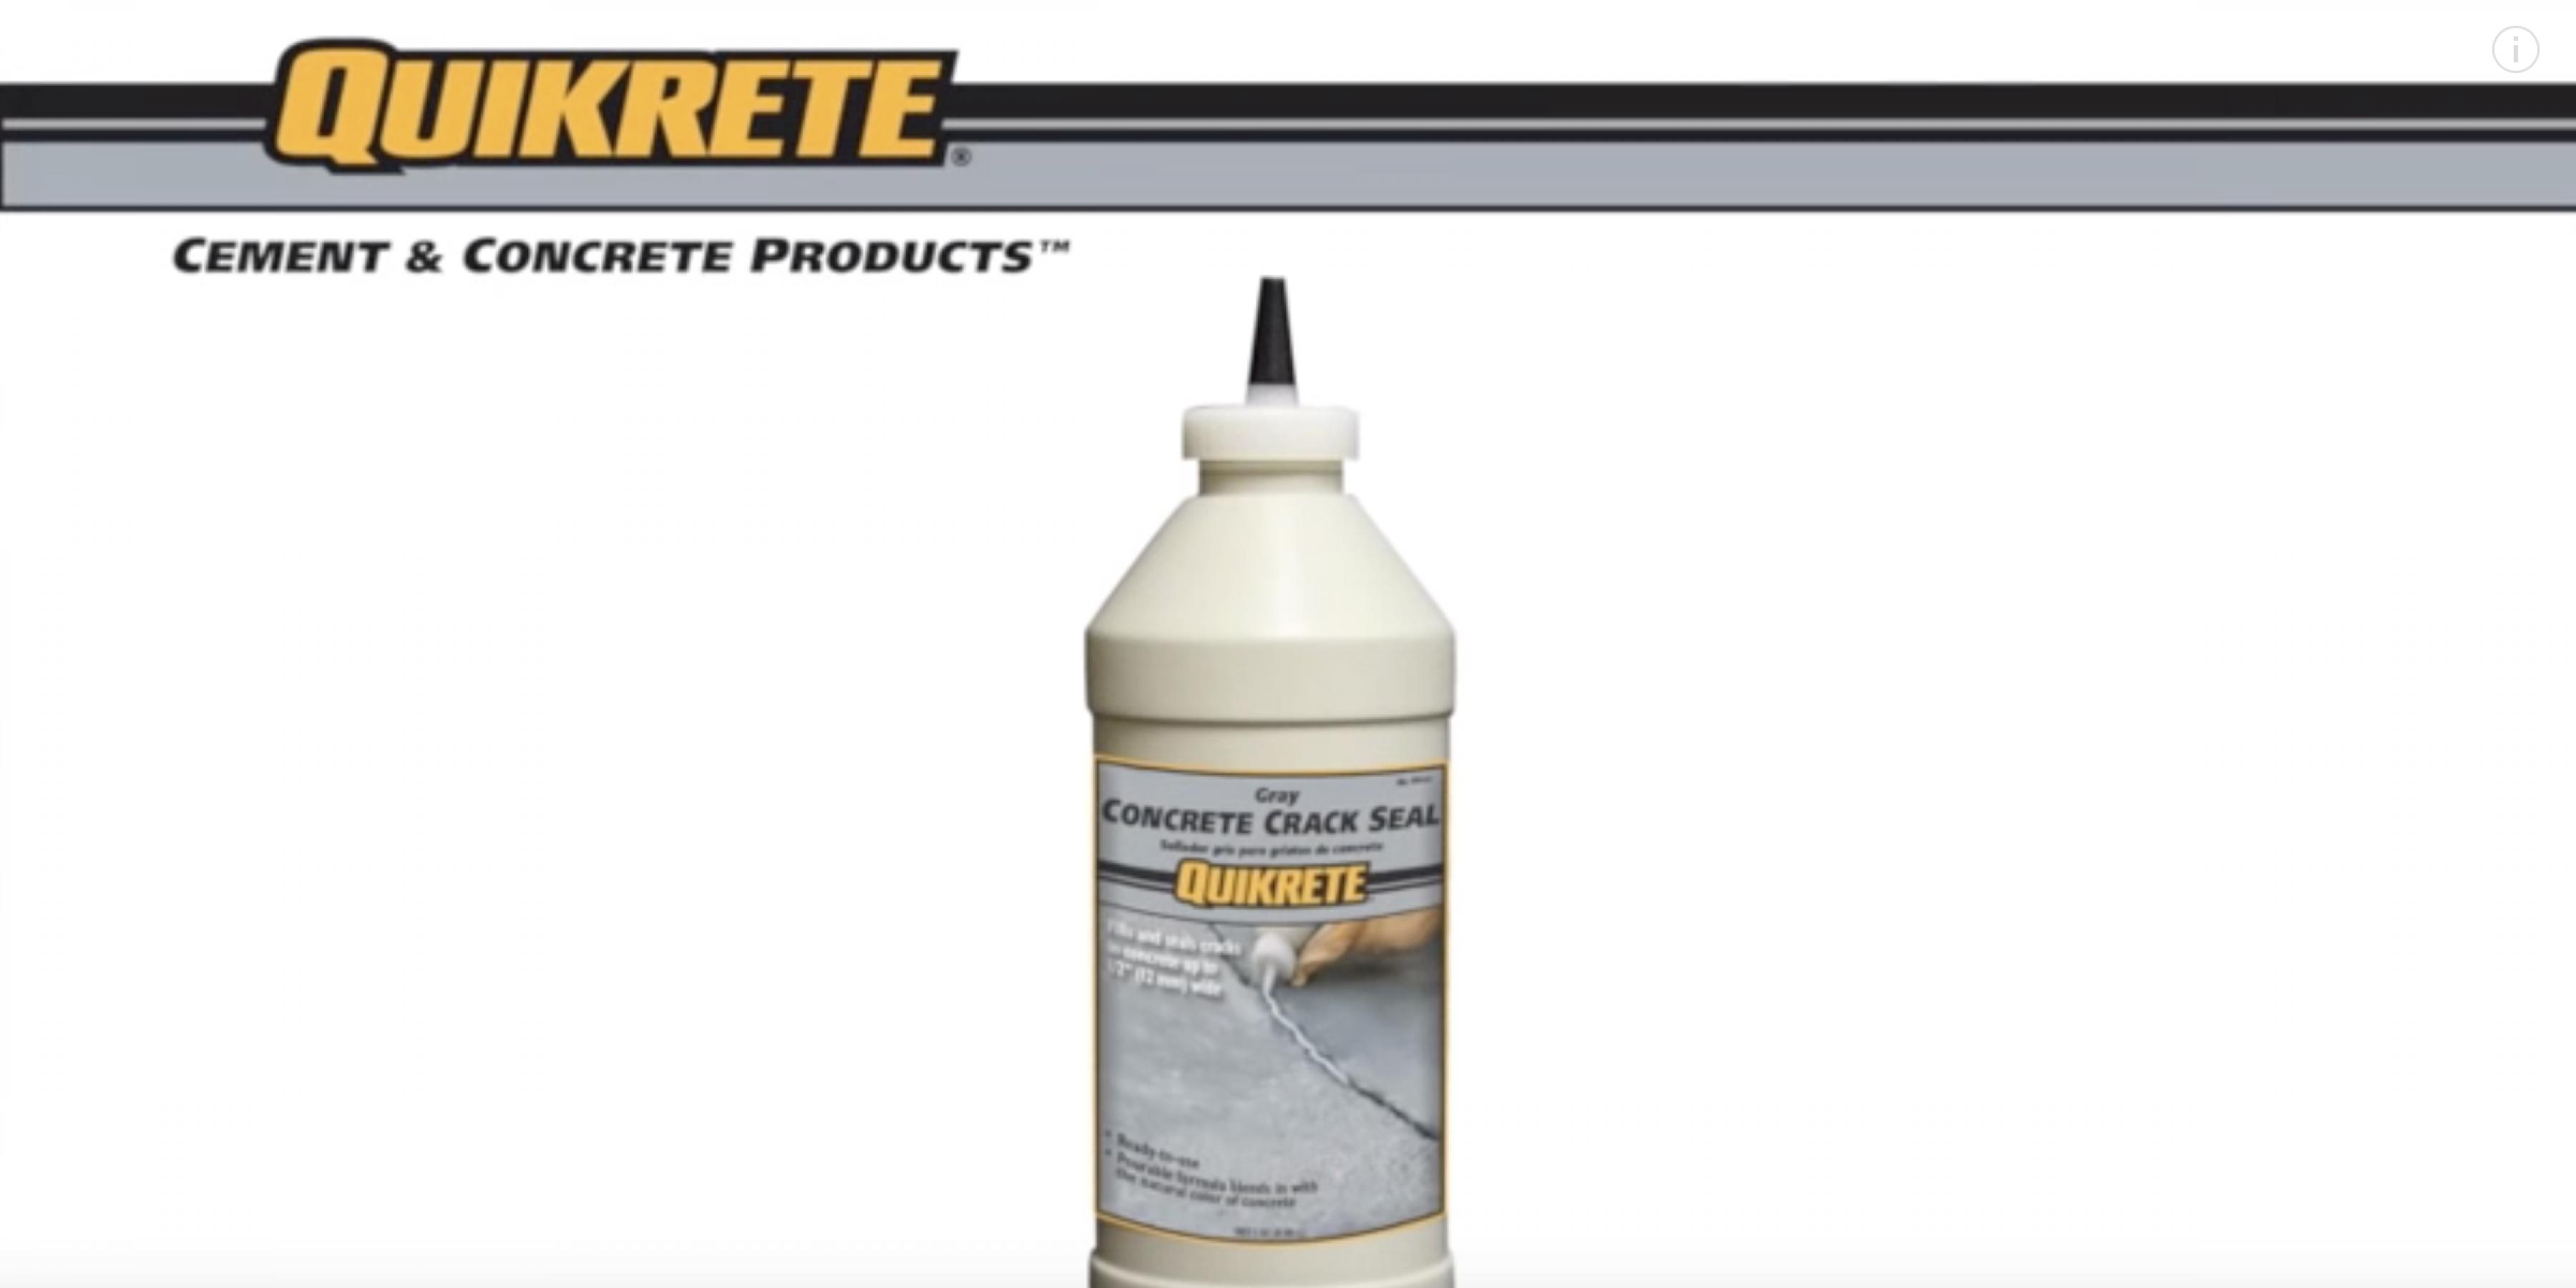 QUIKRETE Concrete Crack Seal (Product Feature)